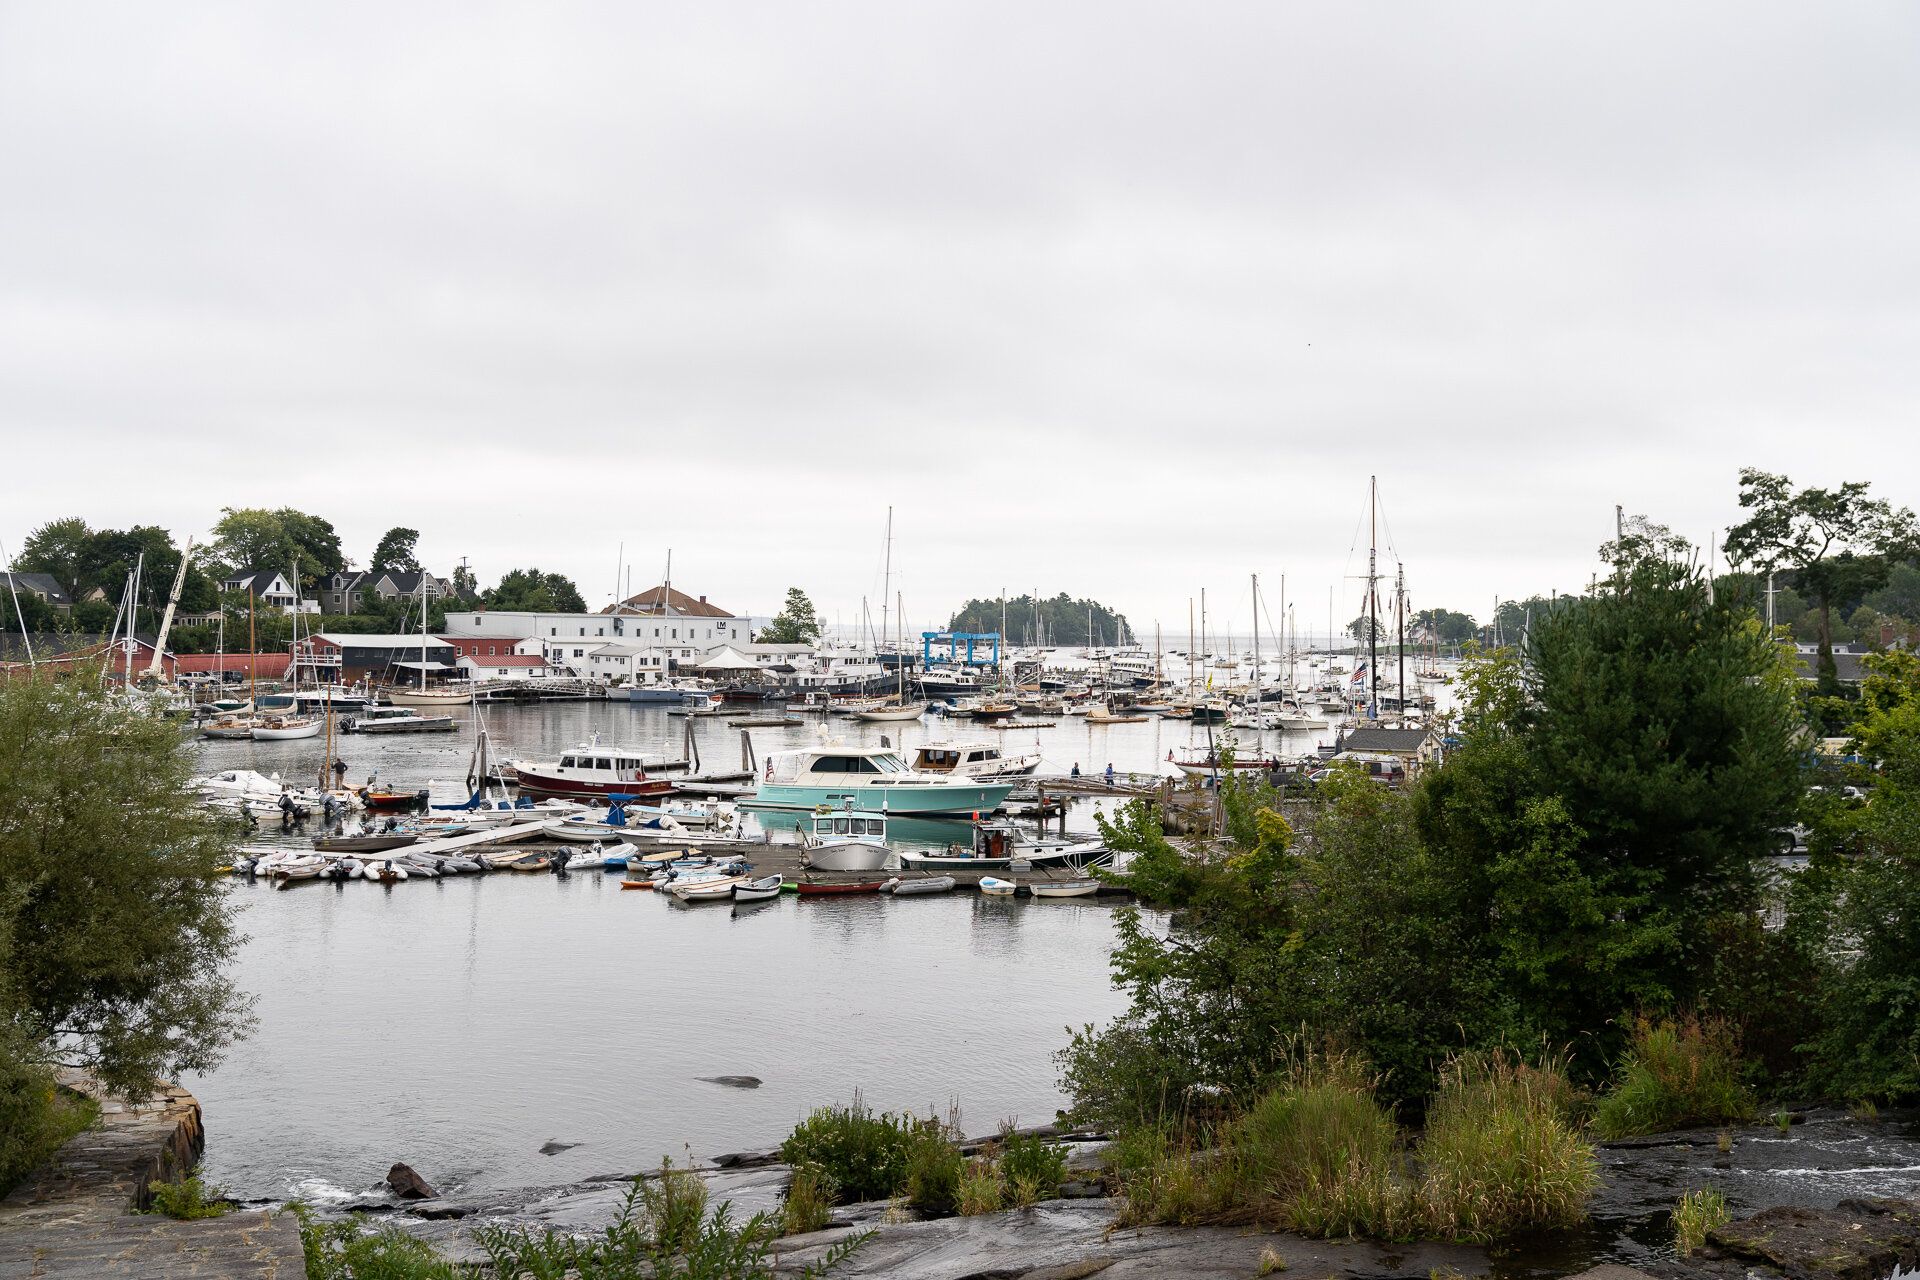 Camden-Maine-vacation-Kathleen-Kathy-Roberts-Asheville-NC-Photographer-9.jpg